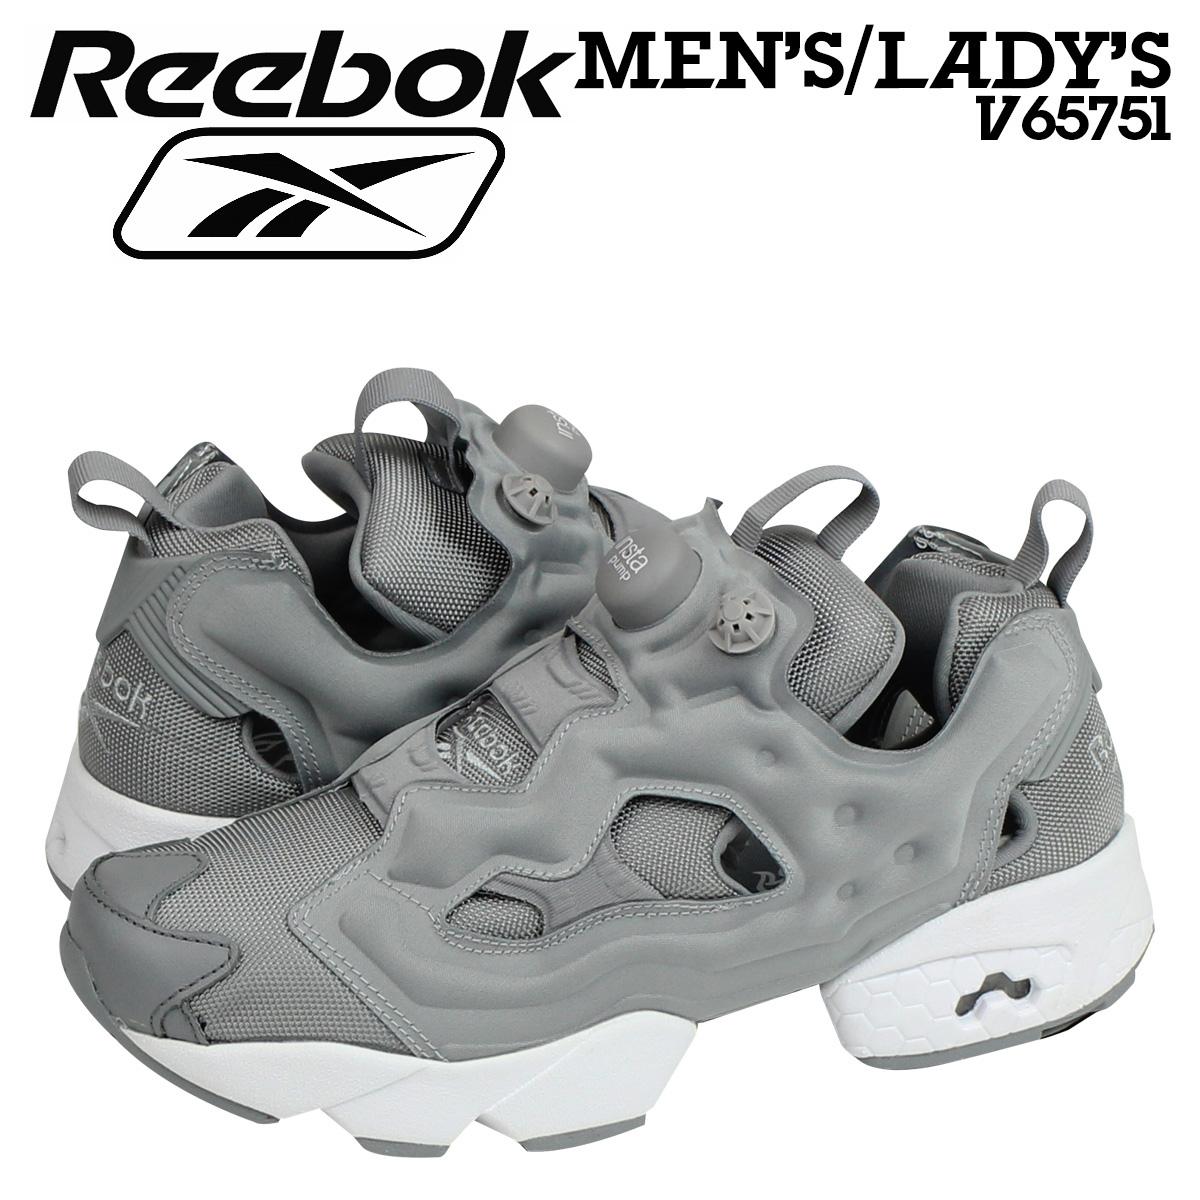 2c991140db1a Reebok Reebok インスタポンプフューリースニーカー INSTAPUMP FURY OG V65751 men gap Dis shoes  gray  the 8 25 additional arrival